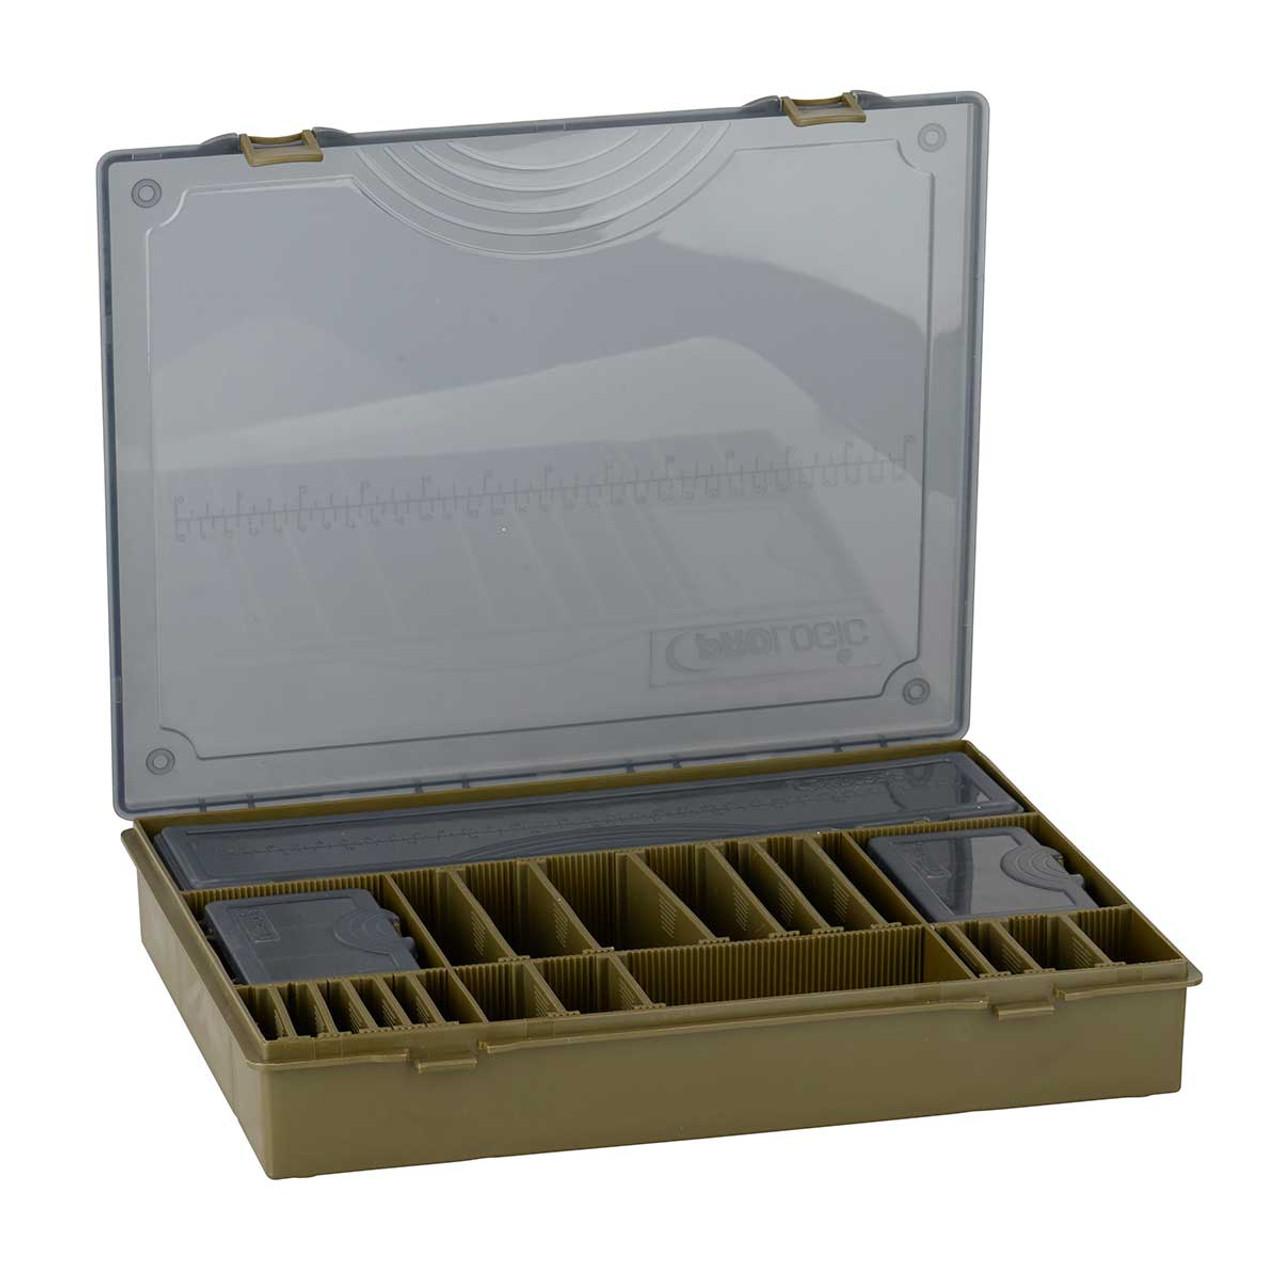 Prologic Tackle Organizer XL 1+6 Box System